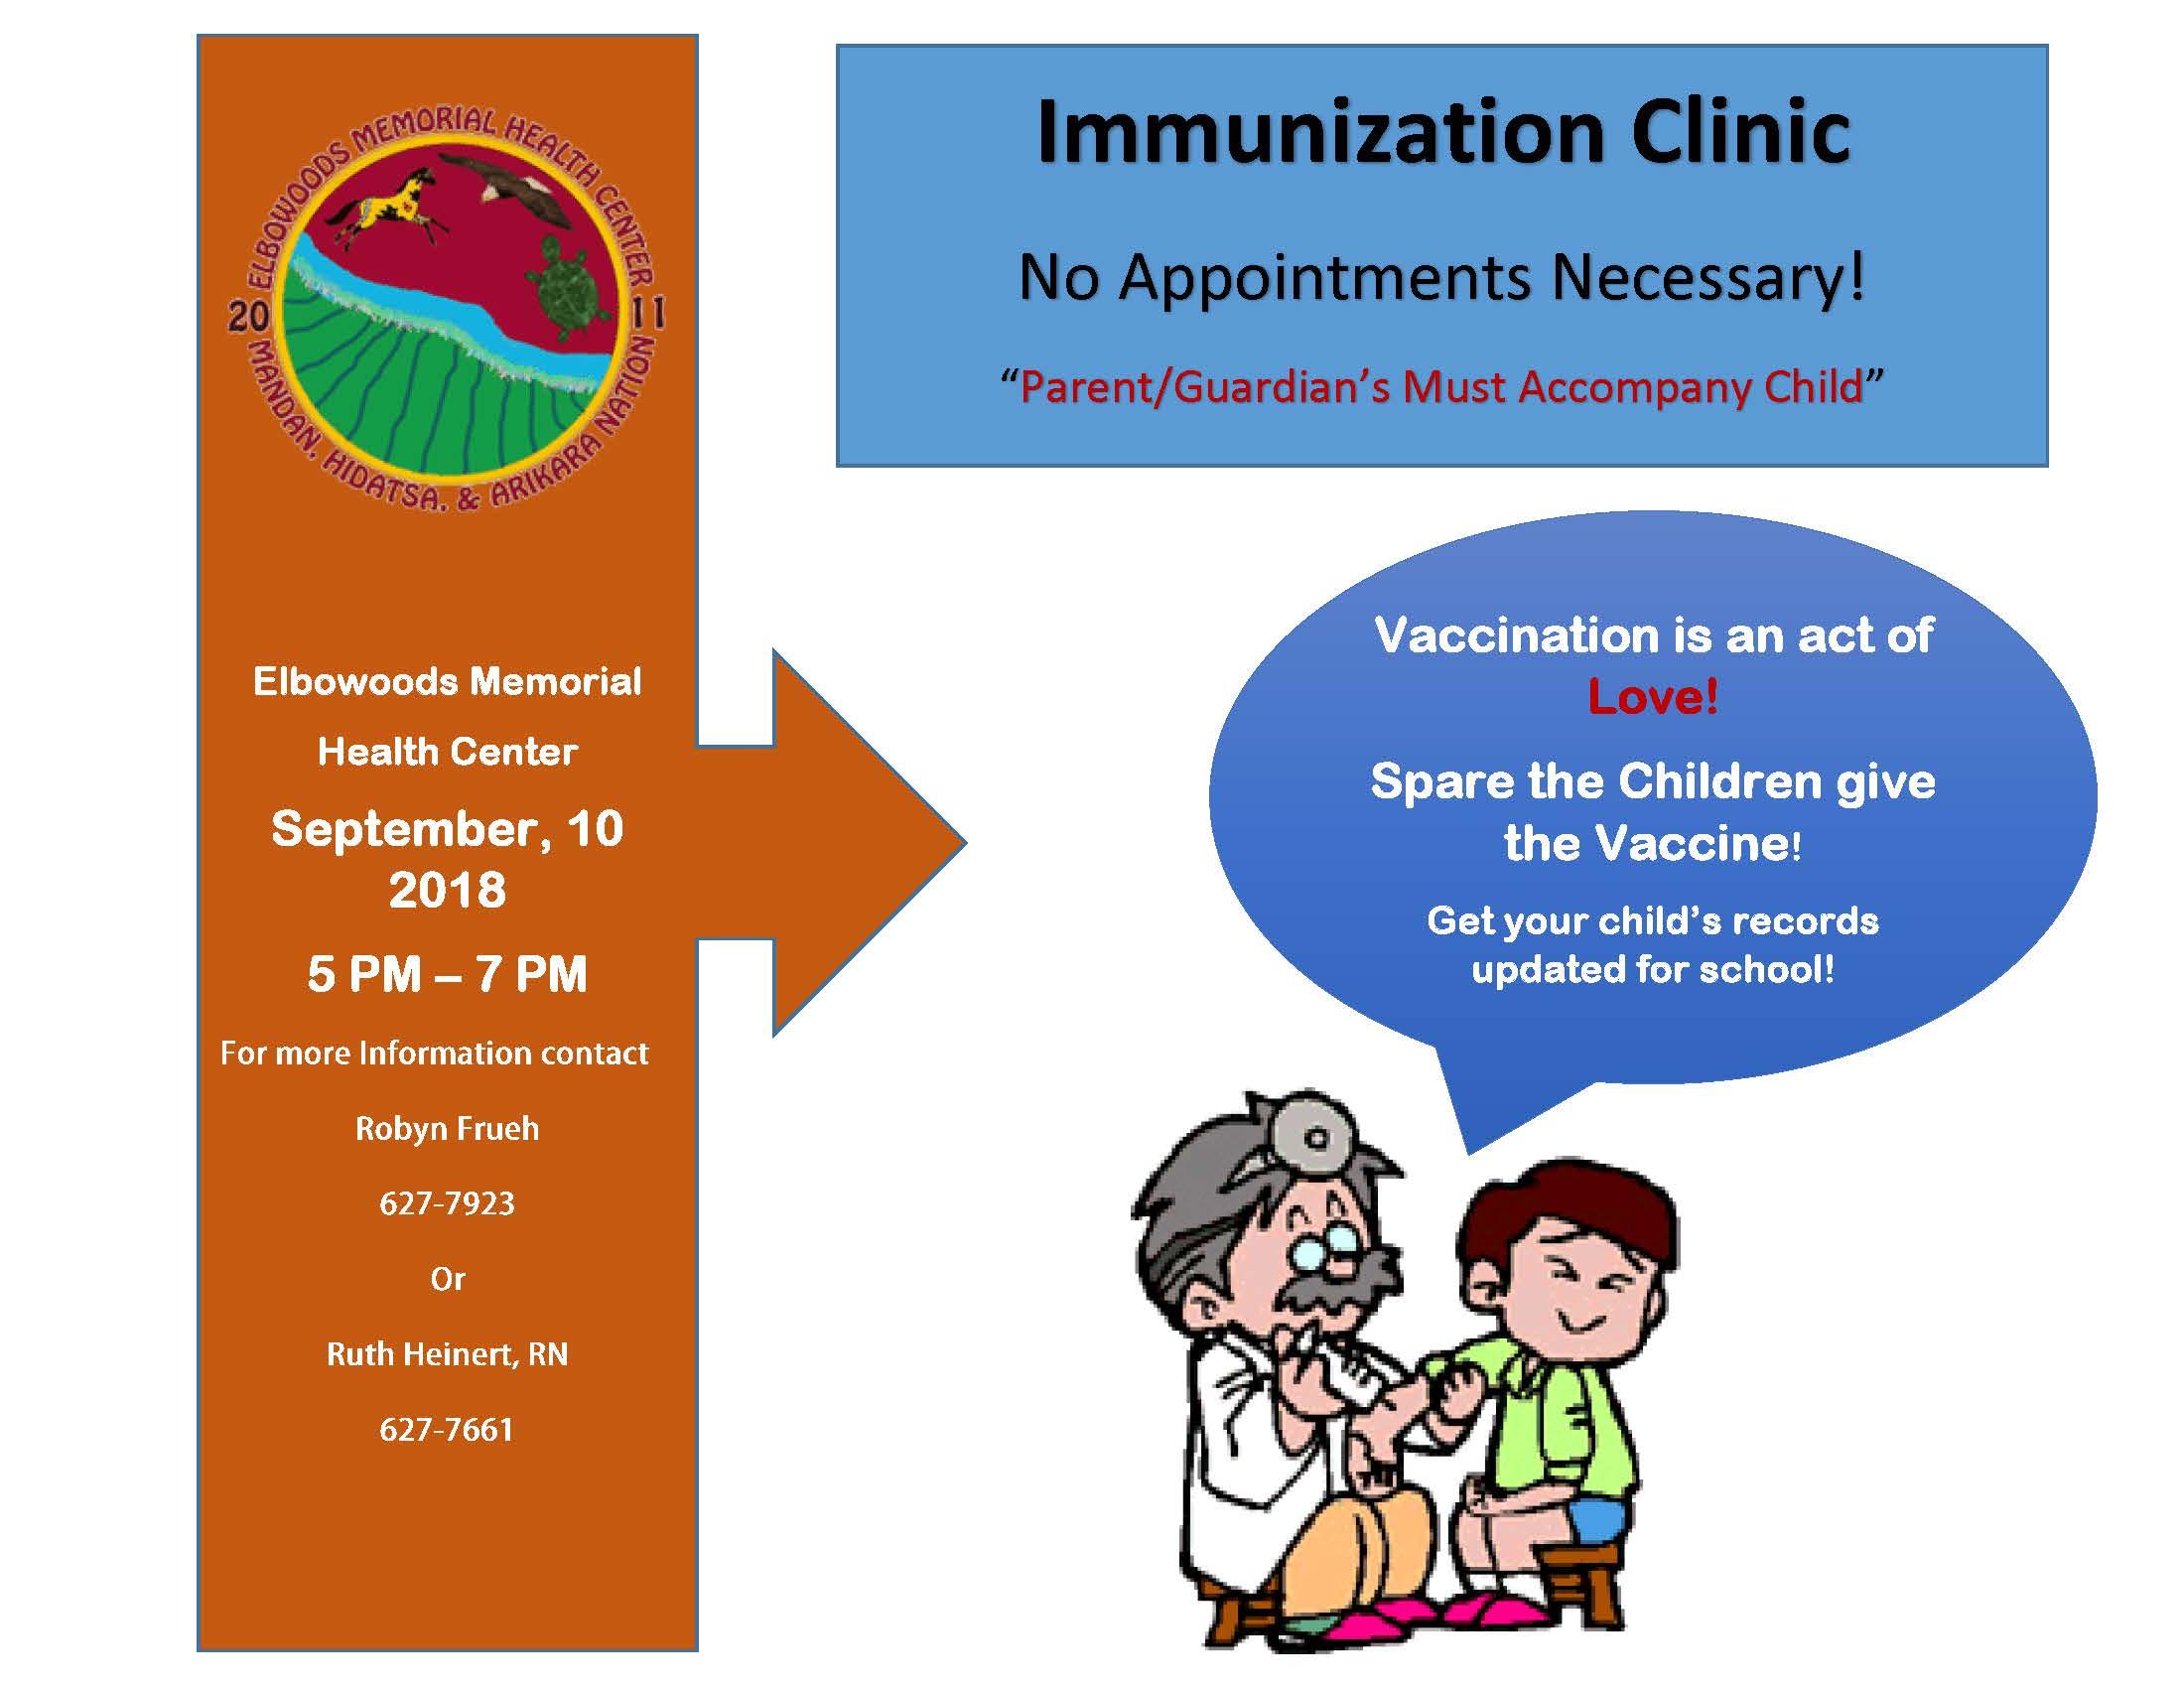 EMHC Immunization Clinic September 10 2018.jpg